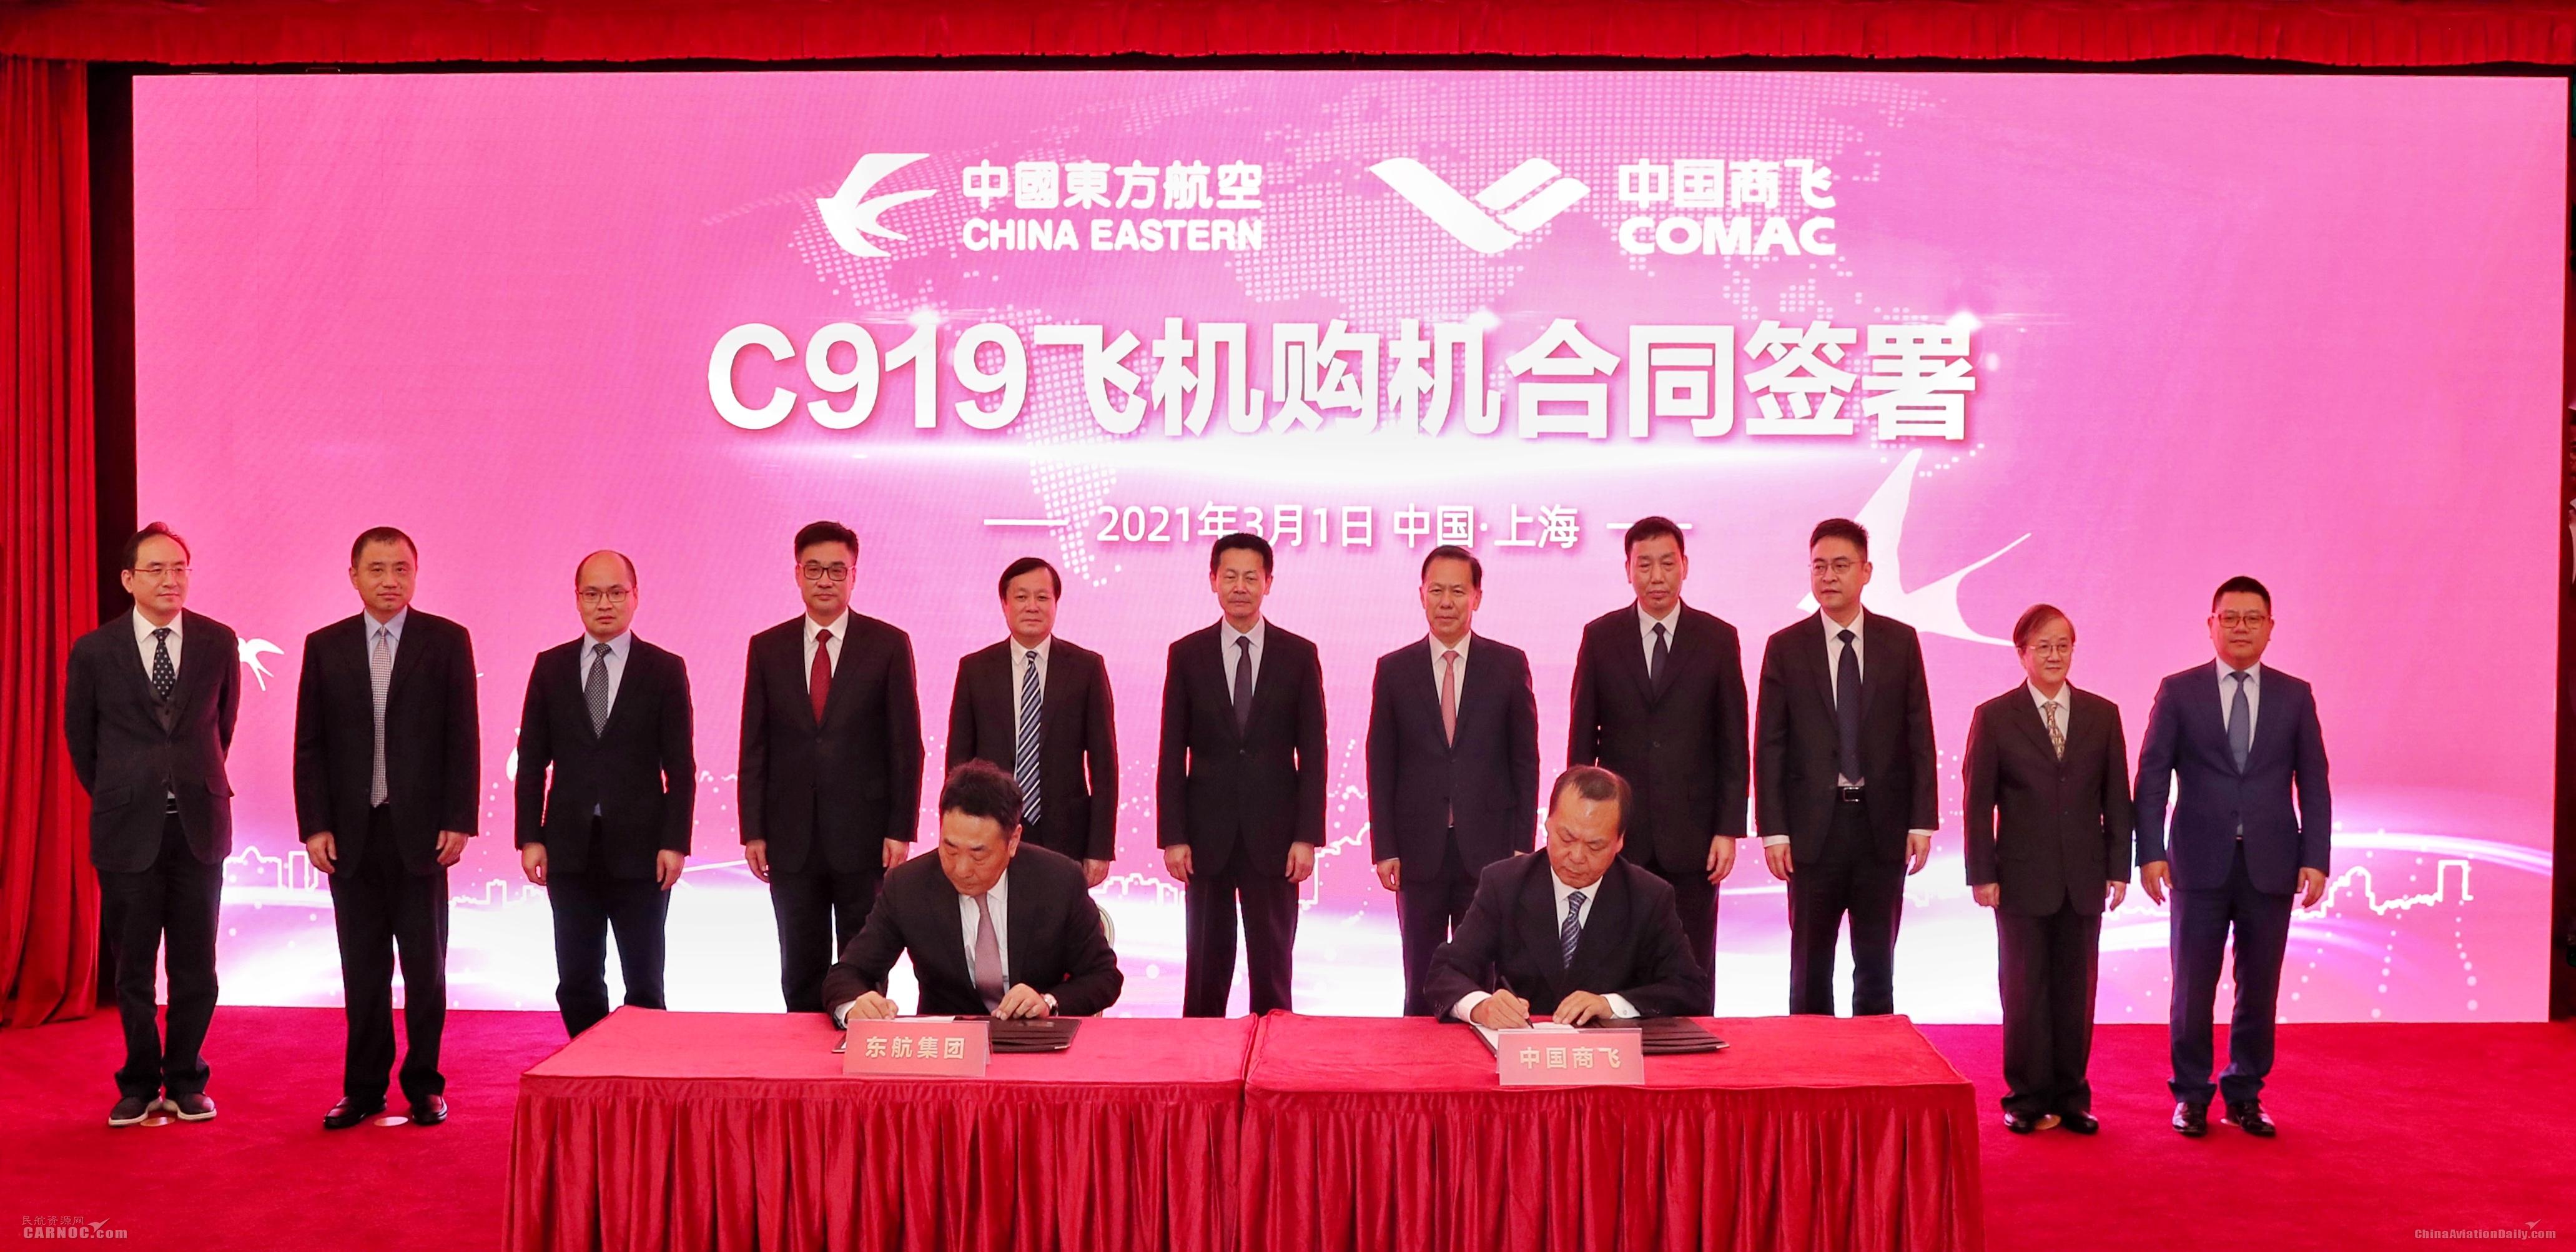 C919全球首单正式落地!东航与中国商飞正式签署首批5架C919购机合同